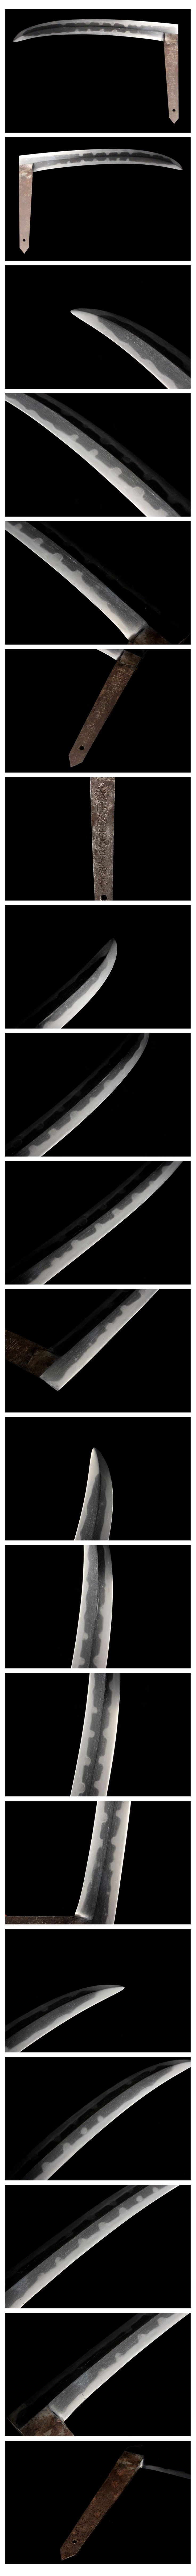 【彩葉】古き時代 美作國藤原兼先 片鎌槍 珍品 ... - ヤフオク!